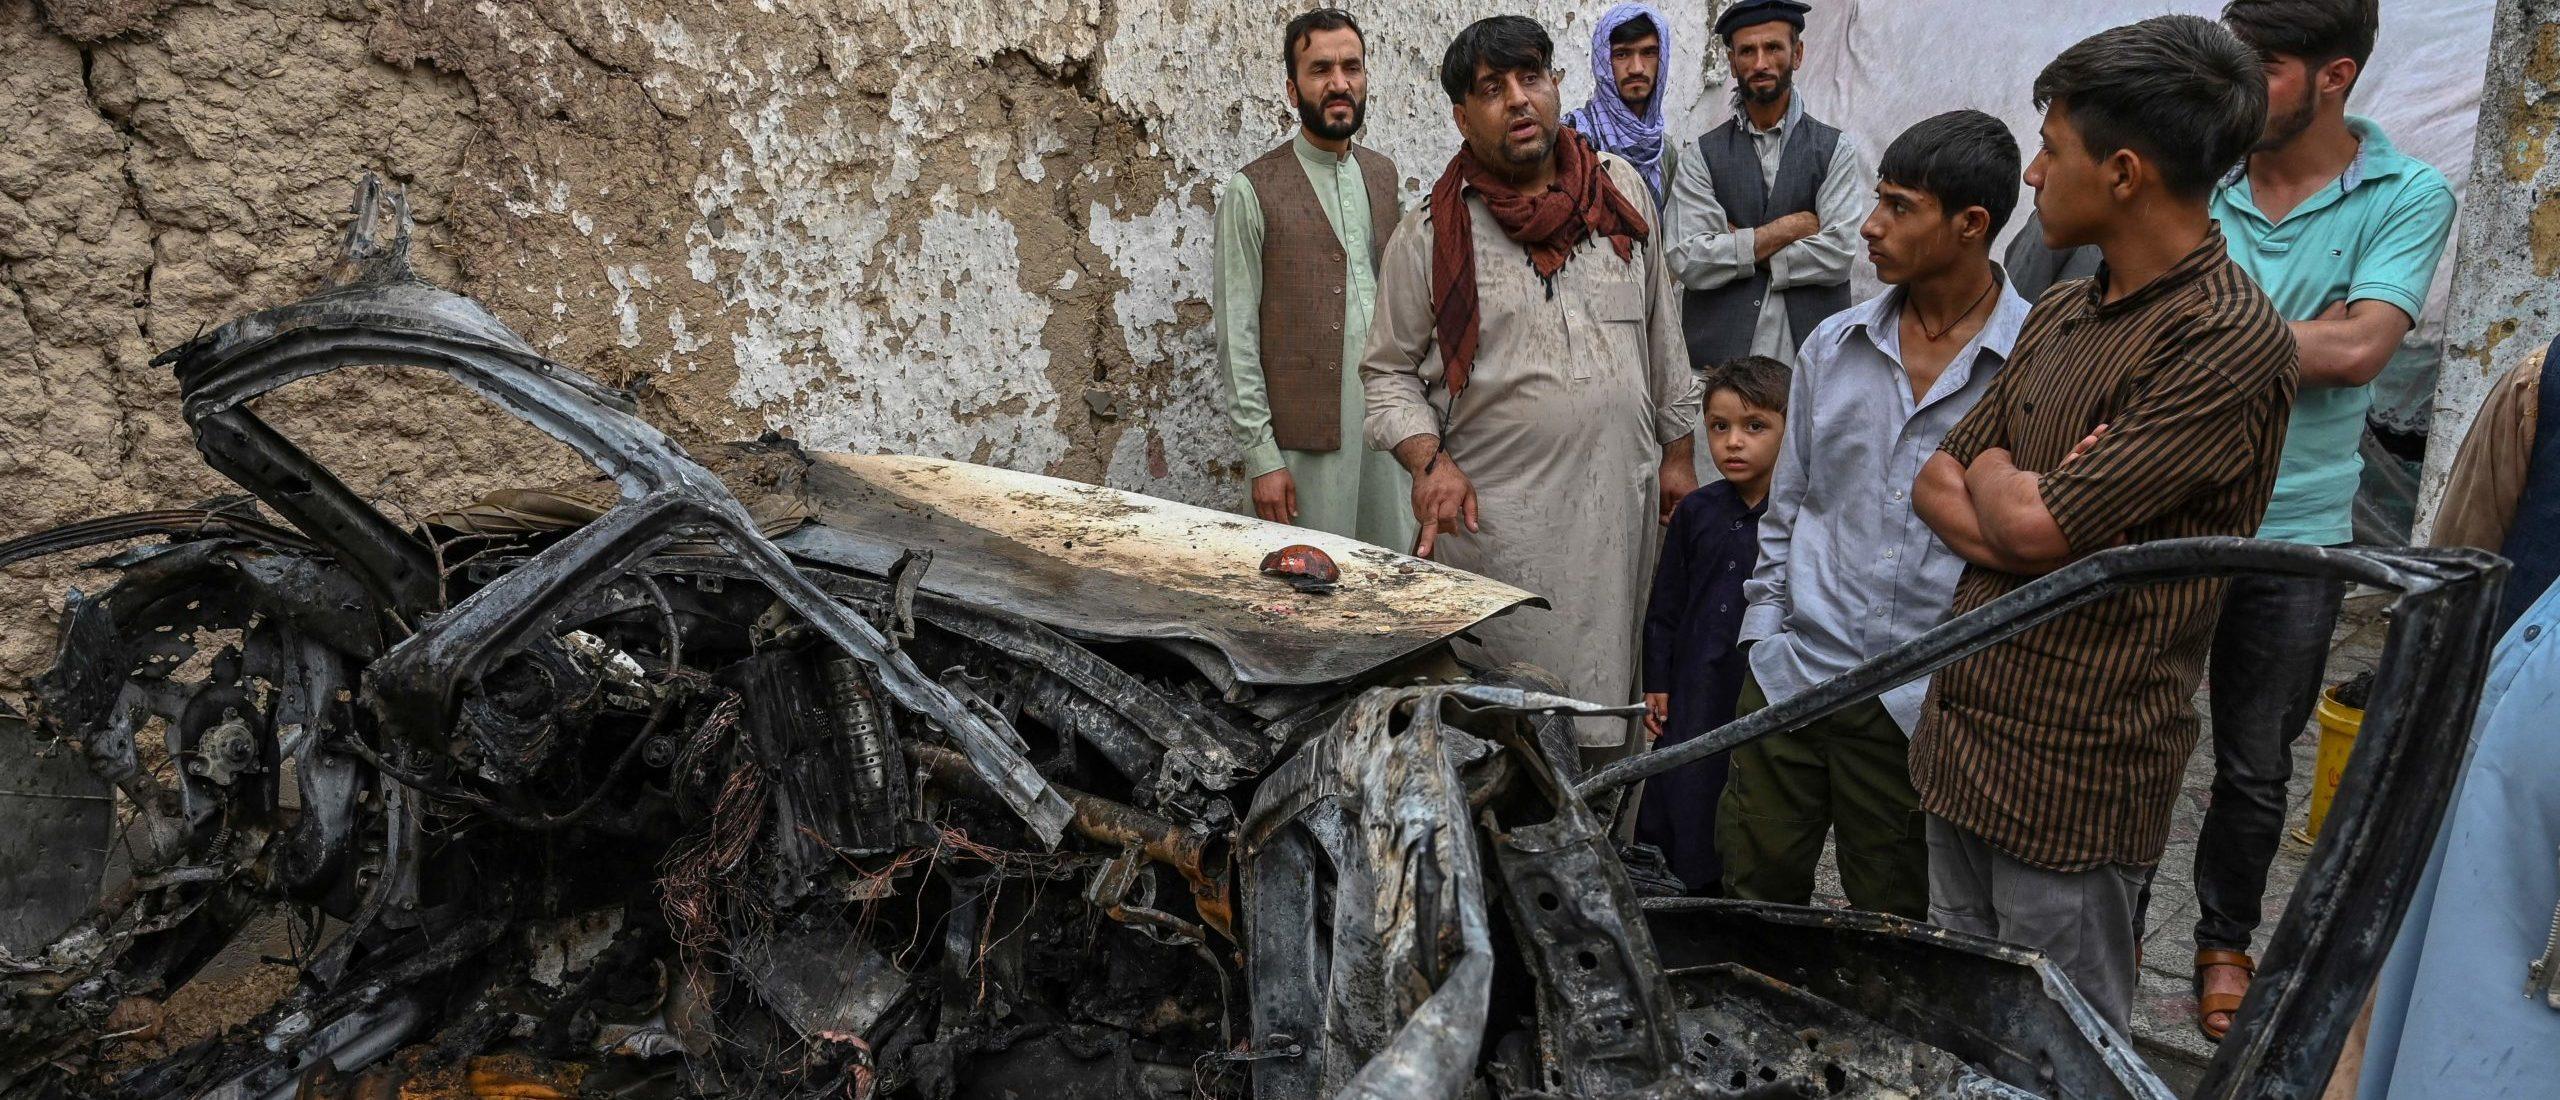 Kabul on August 30, 2021. (Photo by WAKIL KOHSAR / AFP) (Photo by WAKIL KOHSAR/AFP via Getty Images)